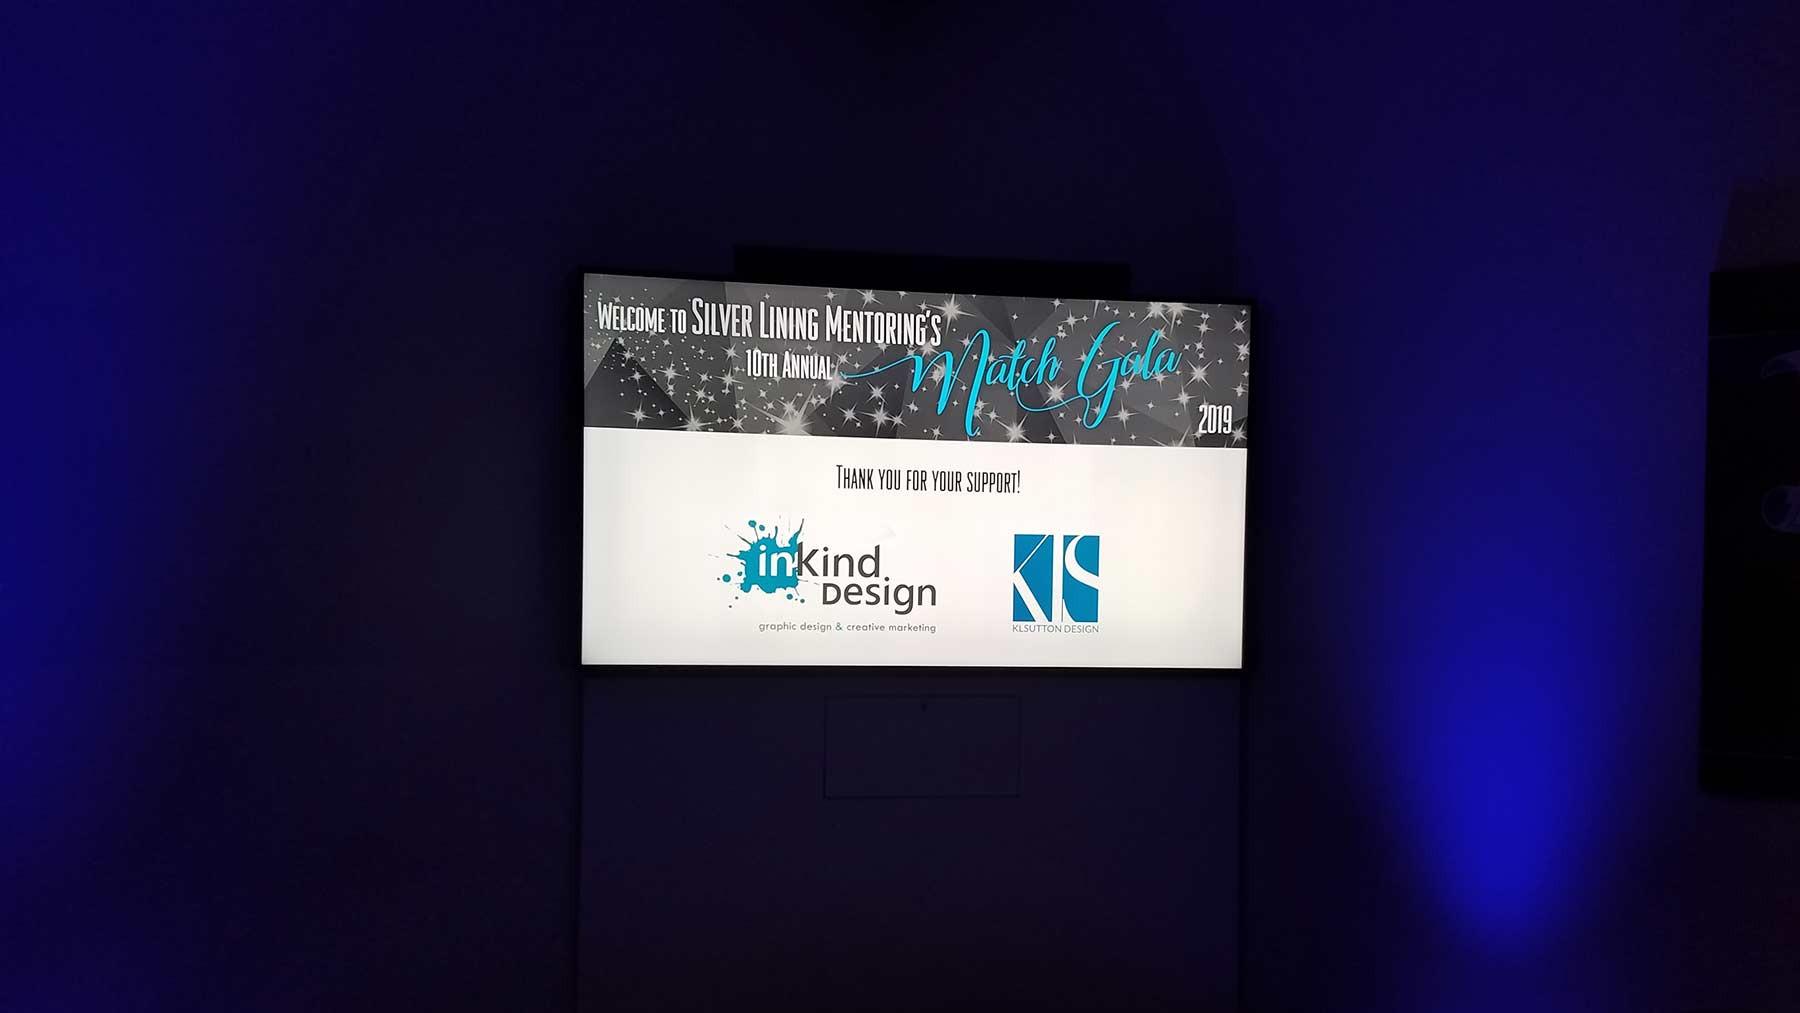 EVENT BRANDING, EXHIBIT DESIGN, PROJECTION SIGNAGE DESIGN